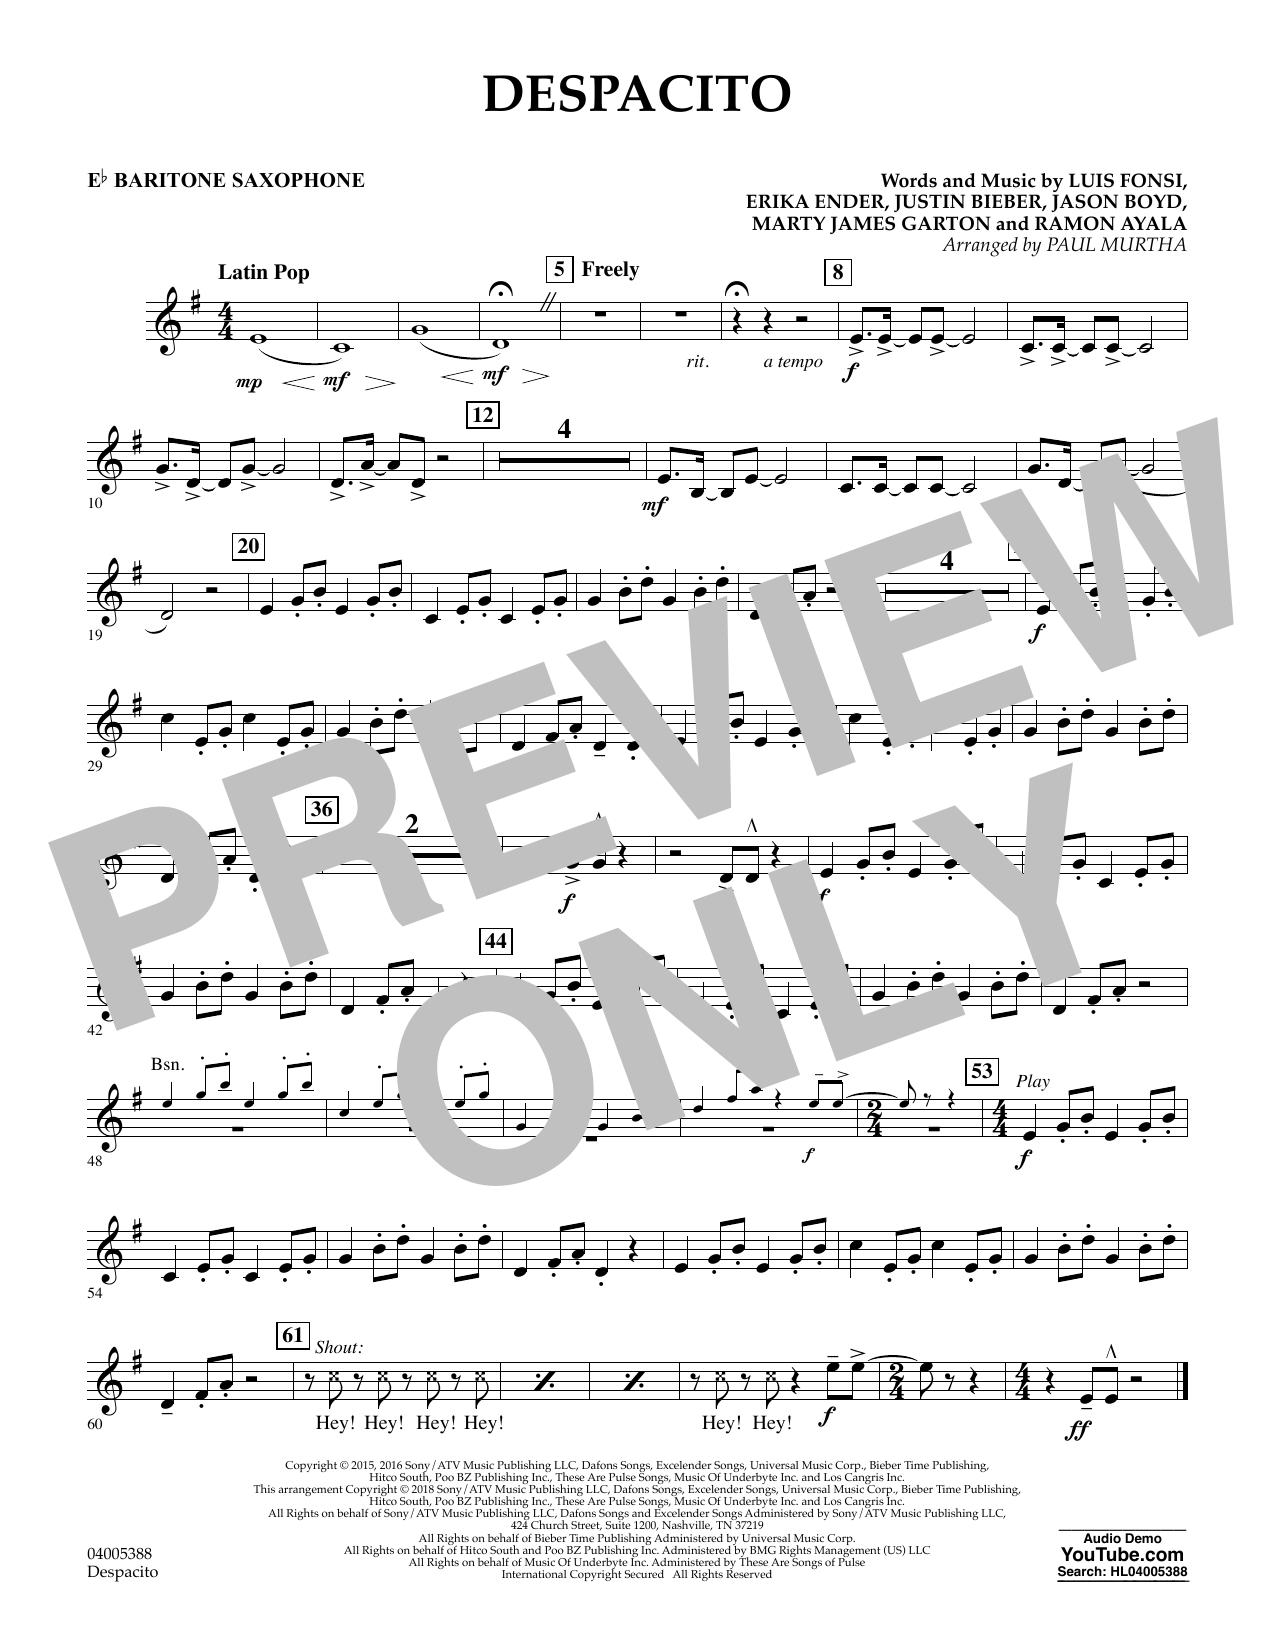 Luis Fonsi Despacito (feat. Daddy Yankee) (arr. Paul Murtha) - Eb Baritone Saxophone sheet music notes and chords. Download Printable PDF.